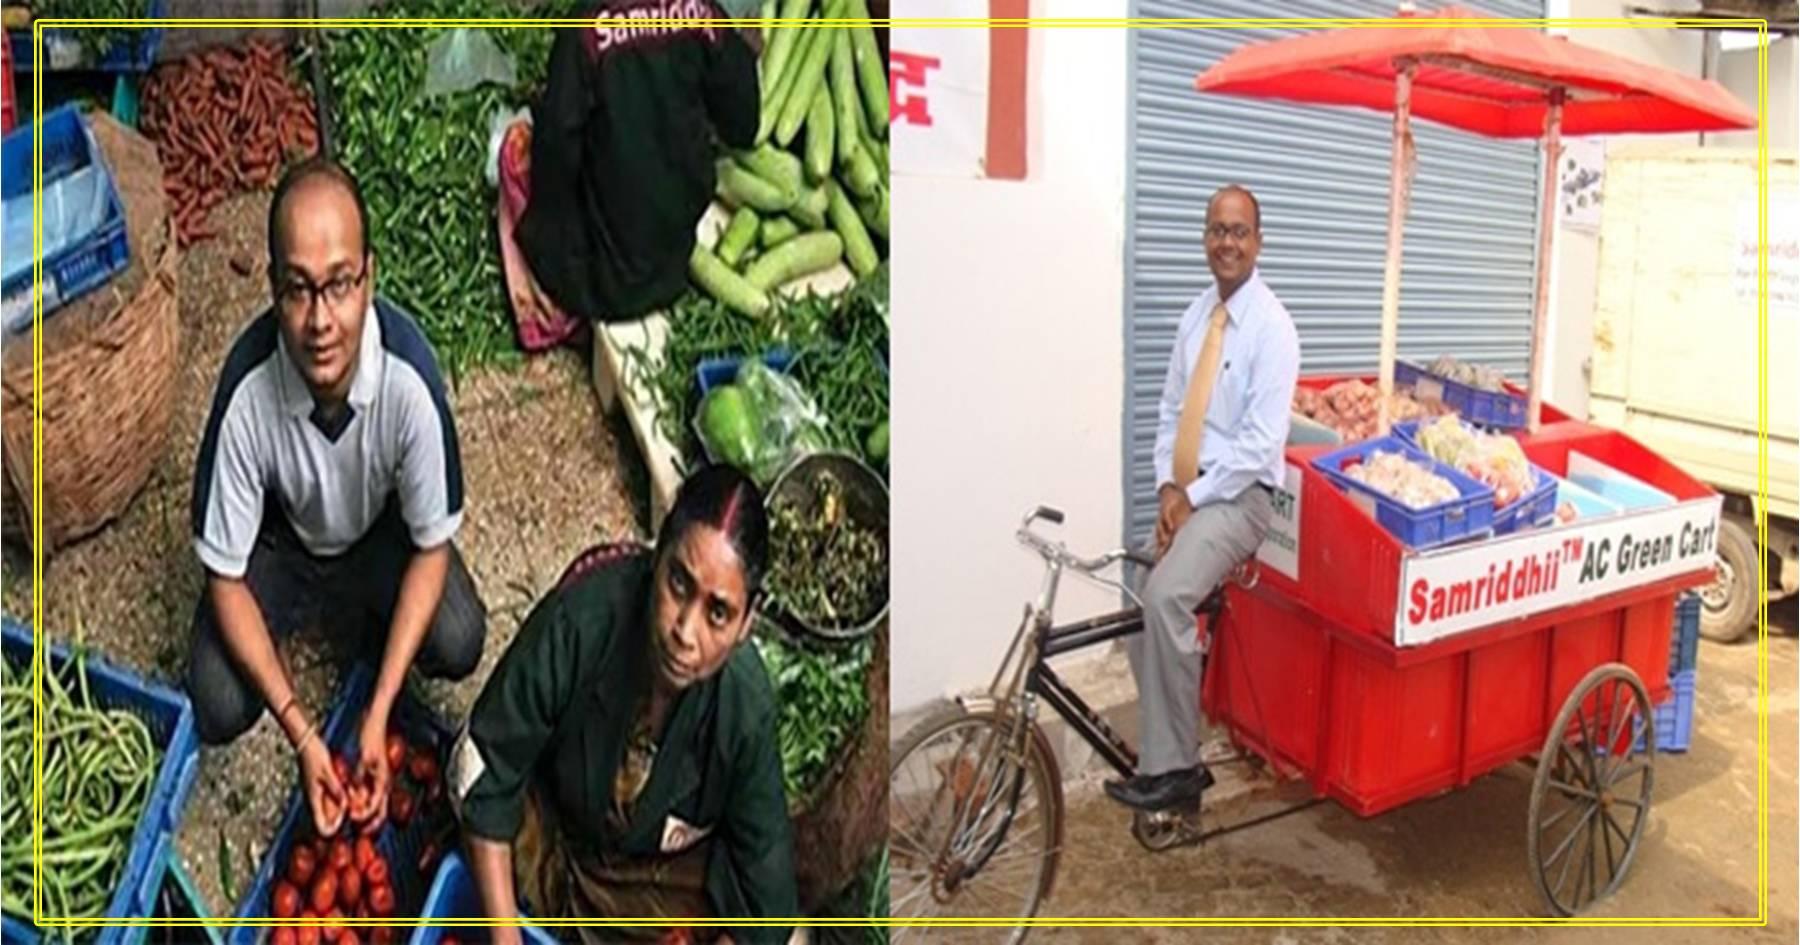 IIM ટોપ કરનાર શાકભાજીનું વેચાણ કરીને કમાય છે કરોડો રૂપિયા, બદલી નાખ્યું ખેડુતોનું જીવન…